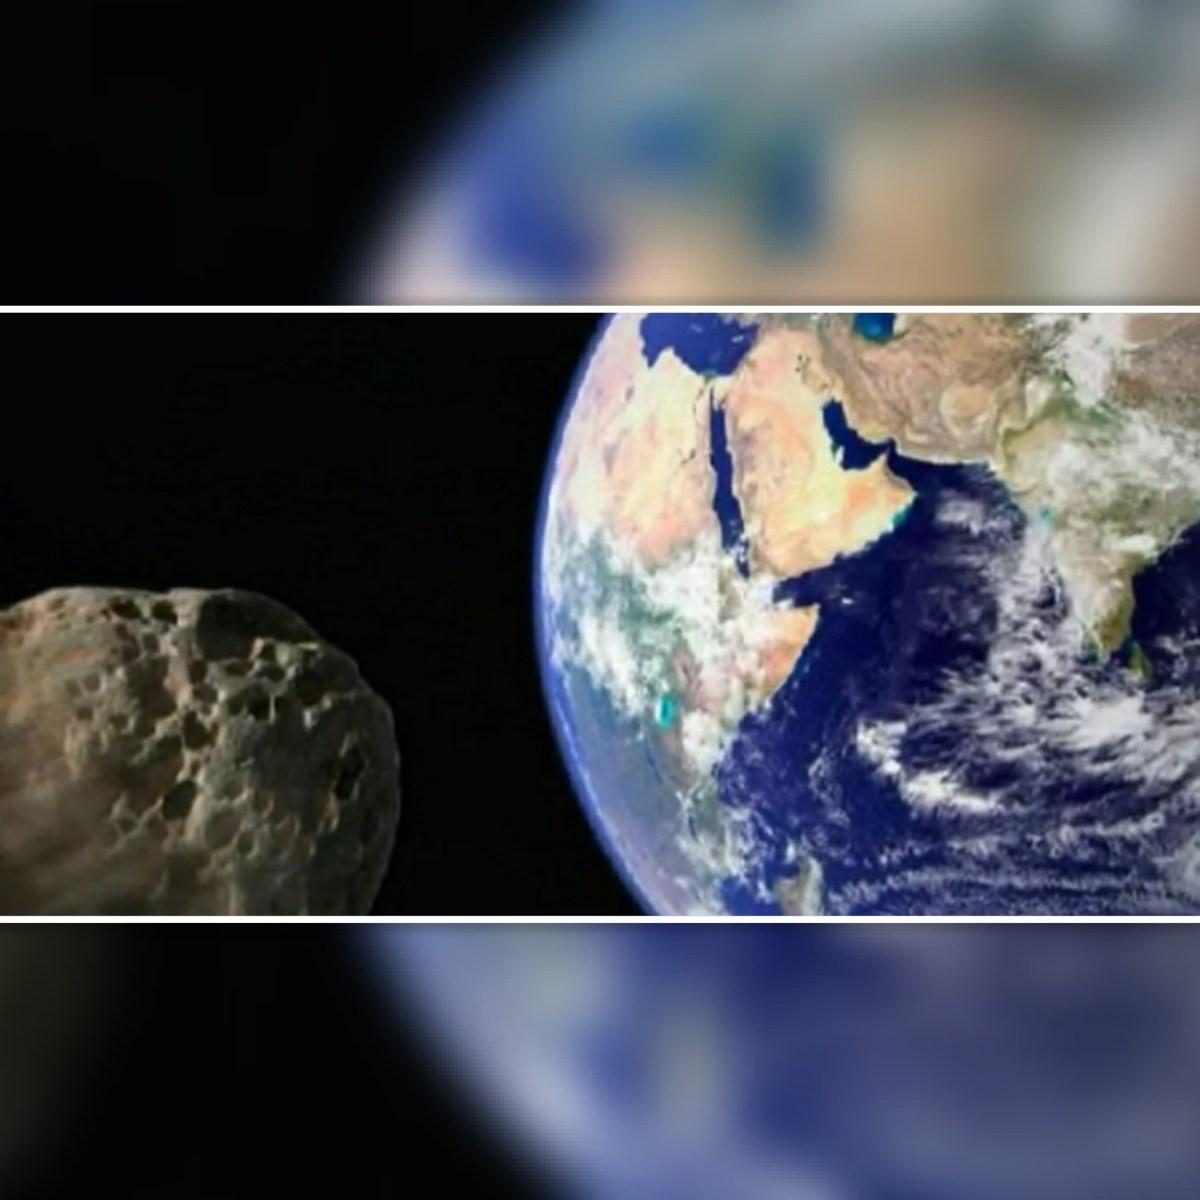 "#AlertaPlanetaria: la #NASA observó asteroide con luna propia ""potencialmente peligroso"""